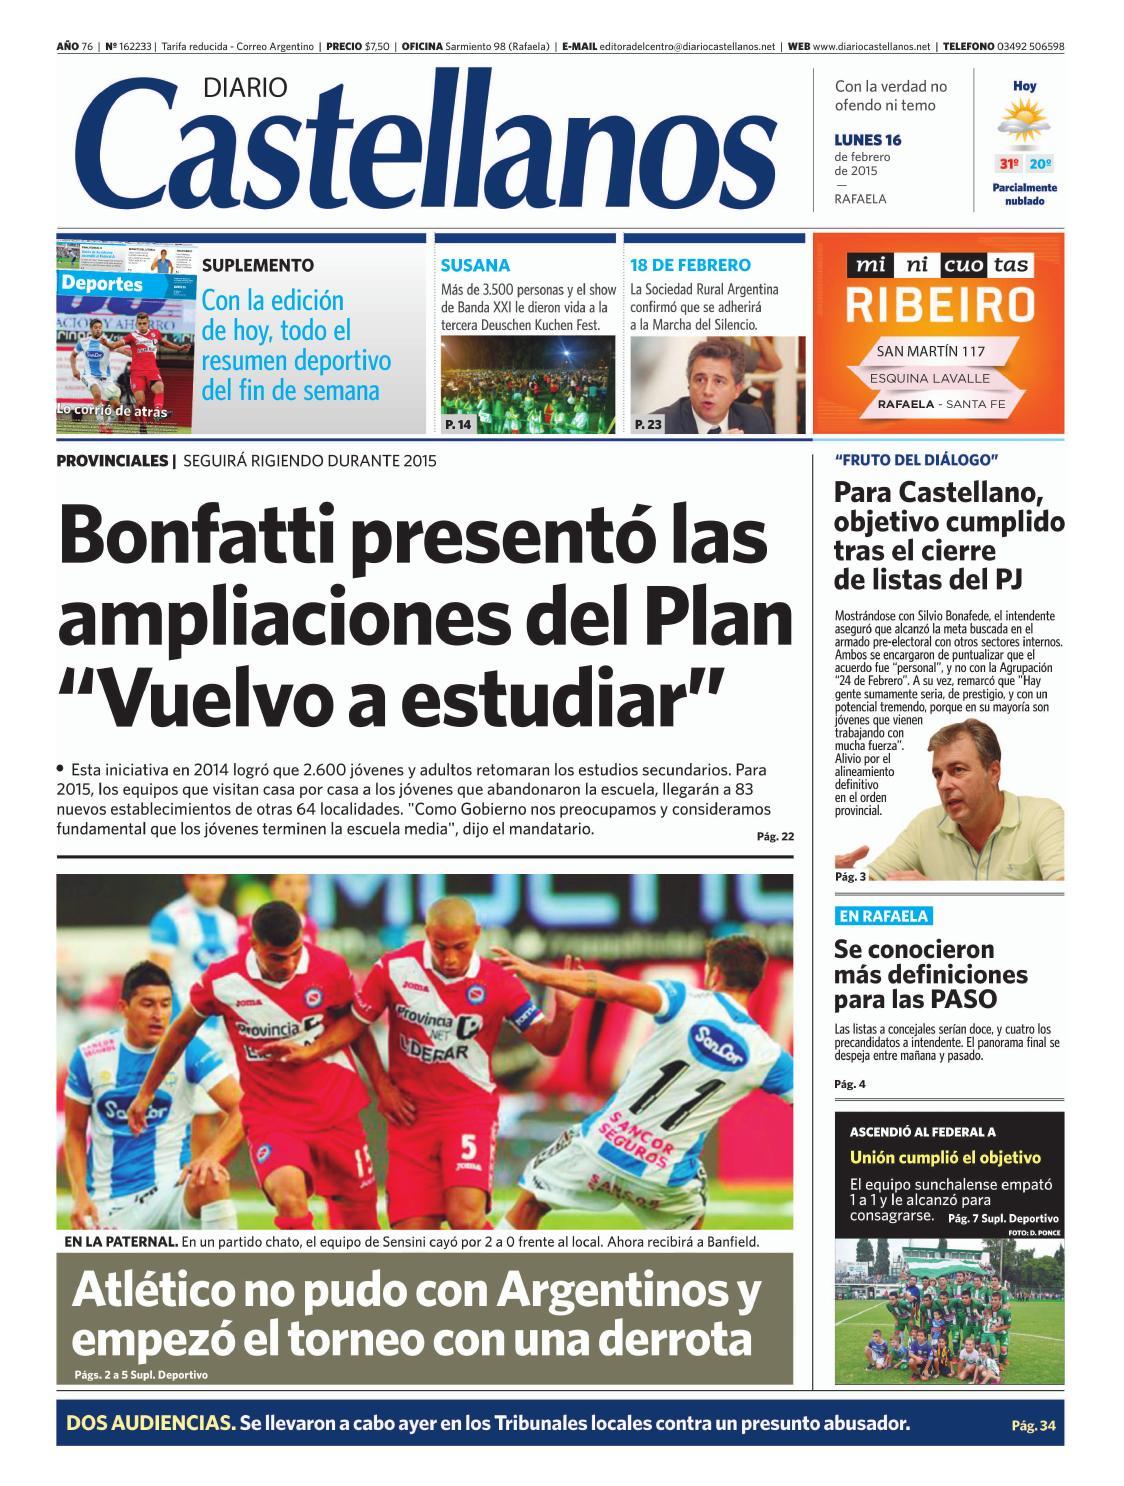 Diario Castellanos 16 02 by Diario Castellanos - issuu 7e9df0a814057